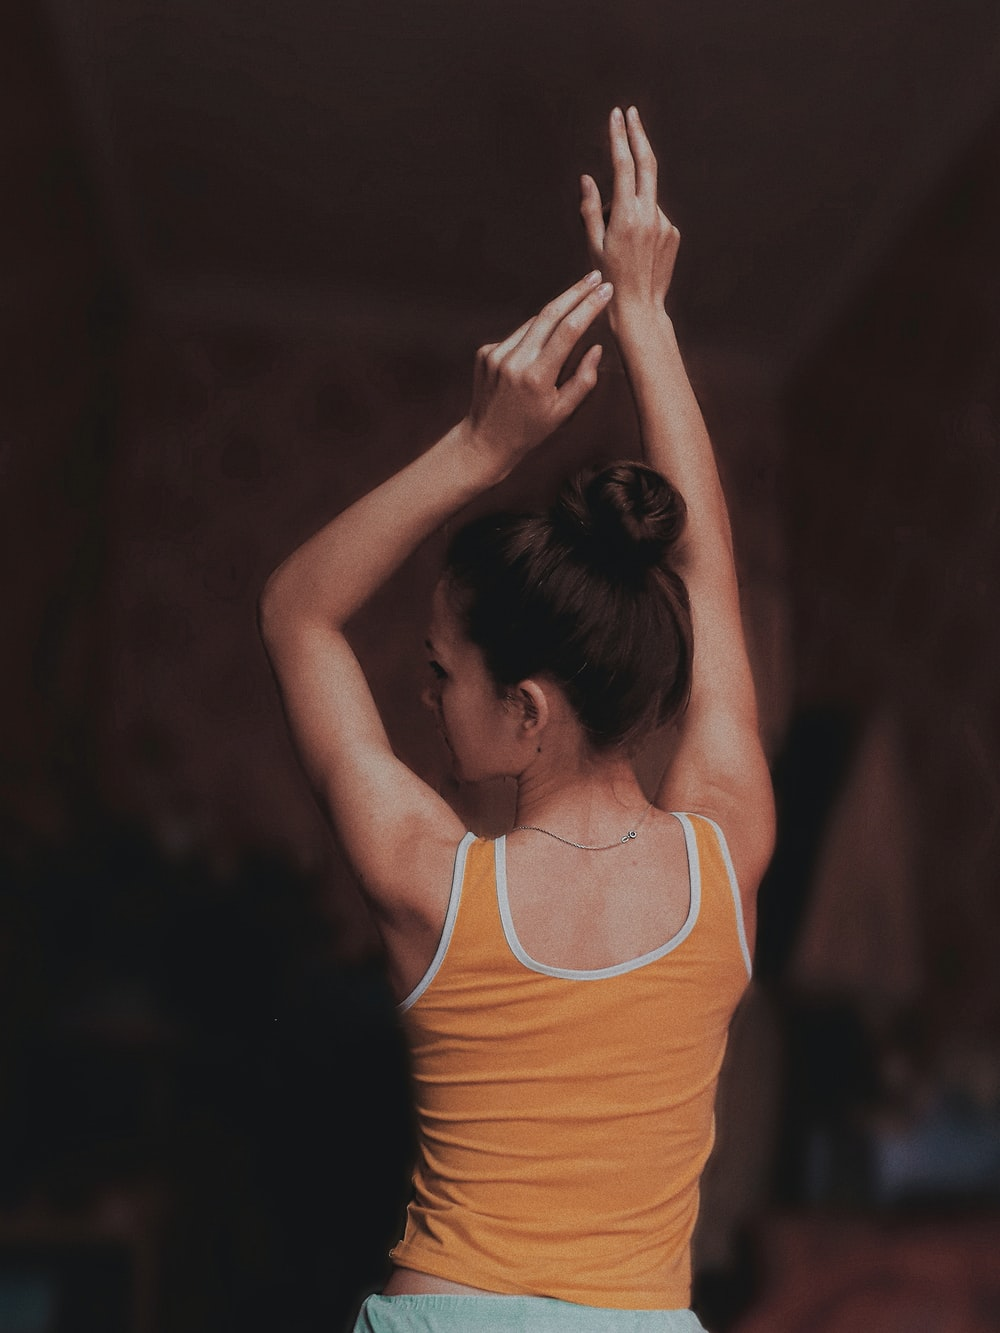 woman raising both hands